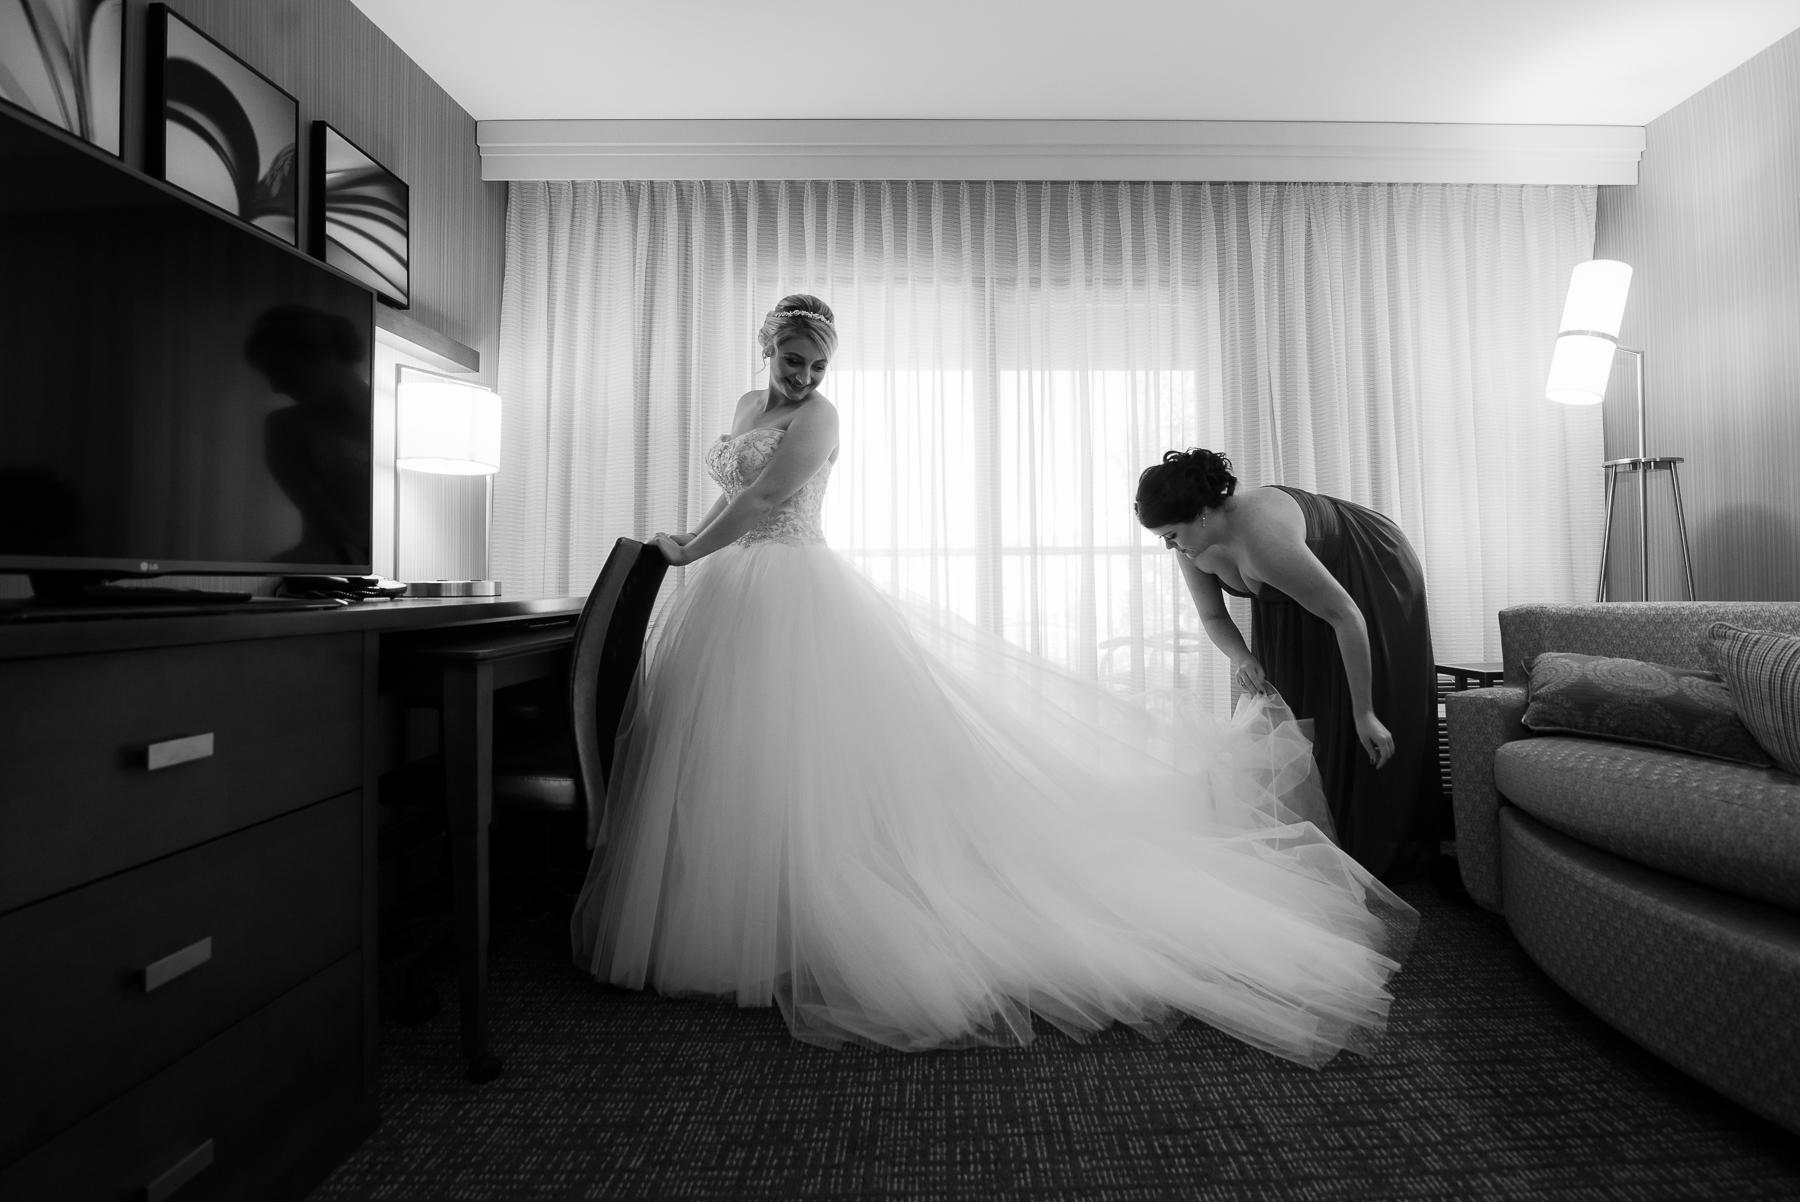 Kim-Ray-Wedding-Garcia-Photography-9750.jpg